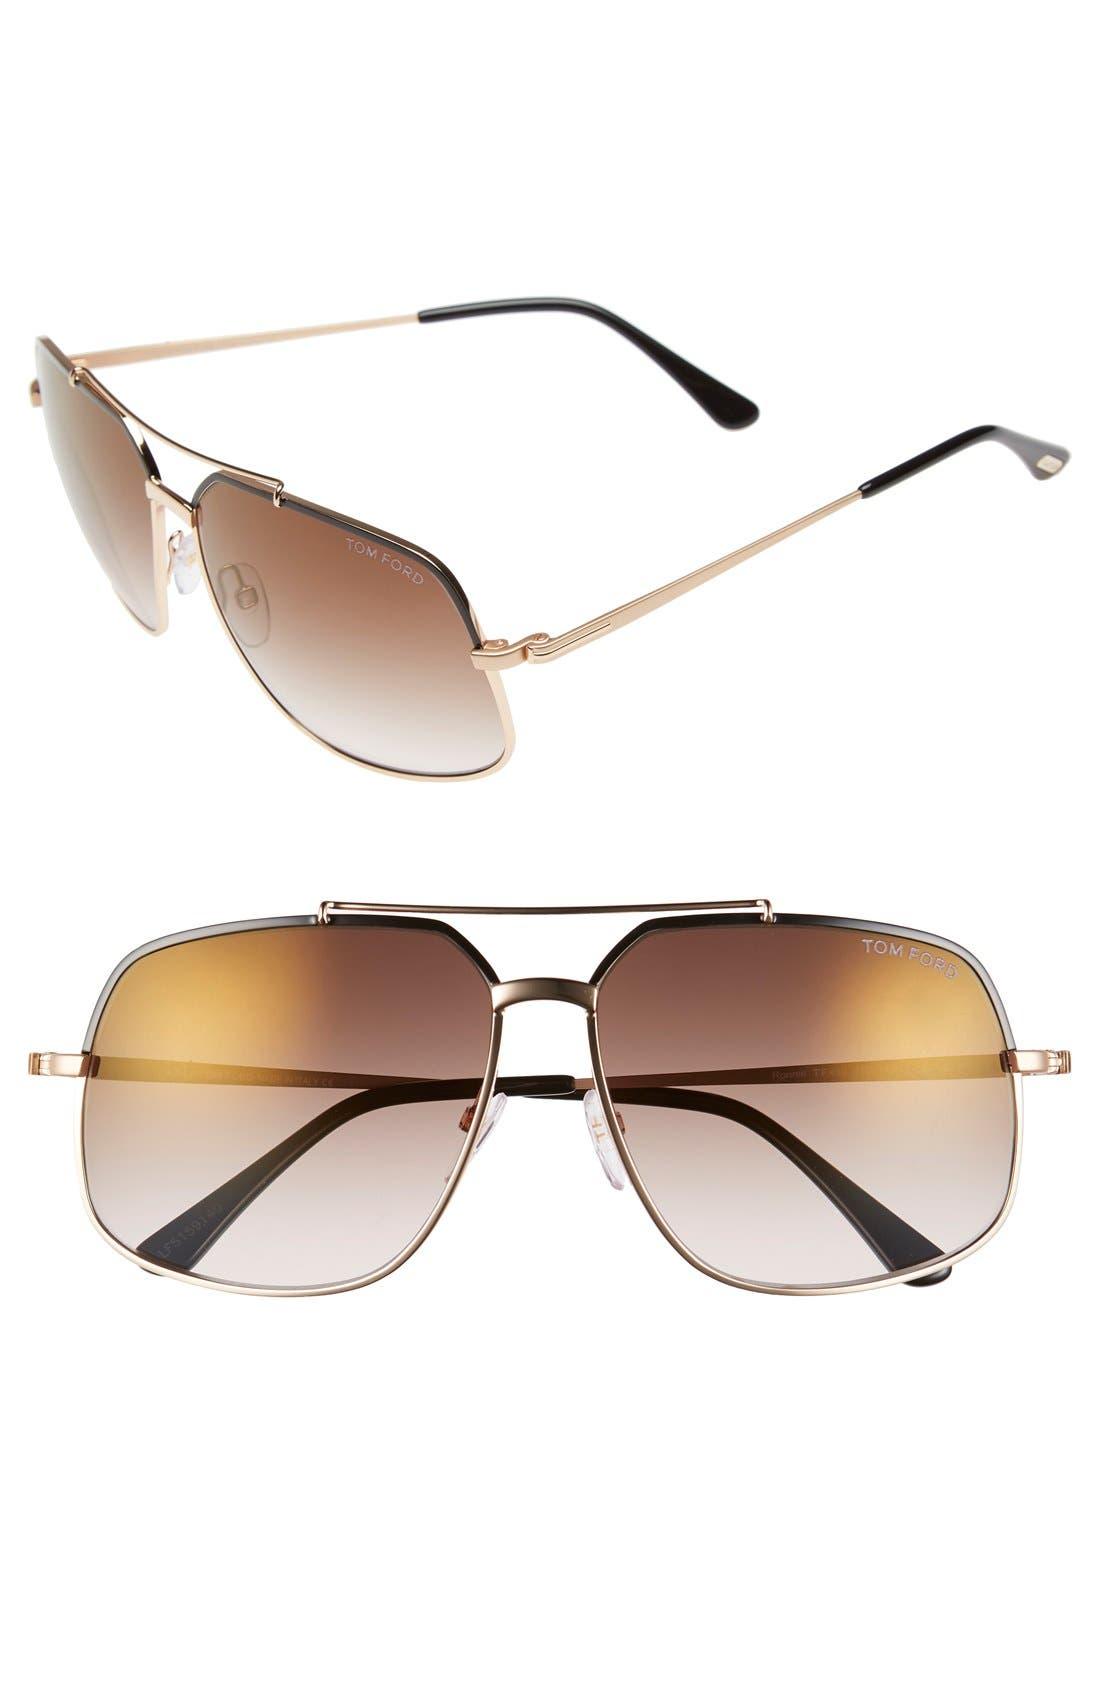 'Ronnie' 60mm Aviator Sunglasses,                         Main,                         color, Shiny Black/ Brown Mirror